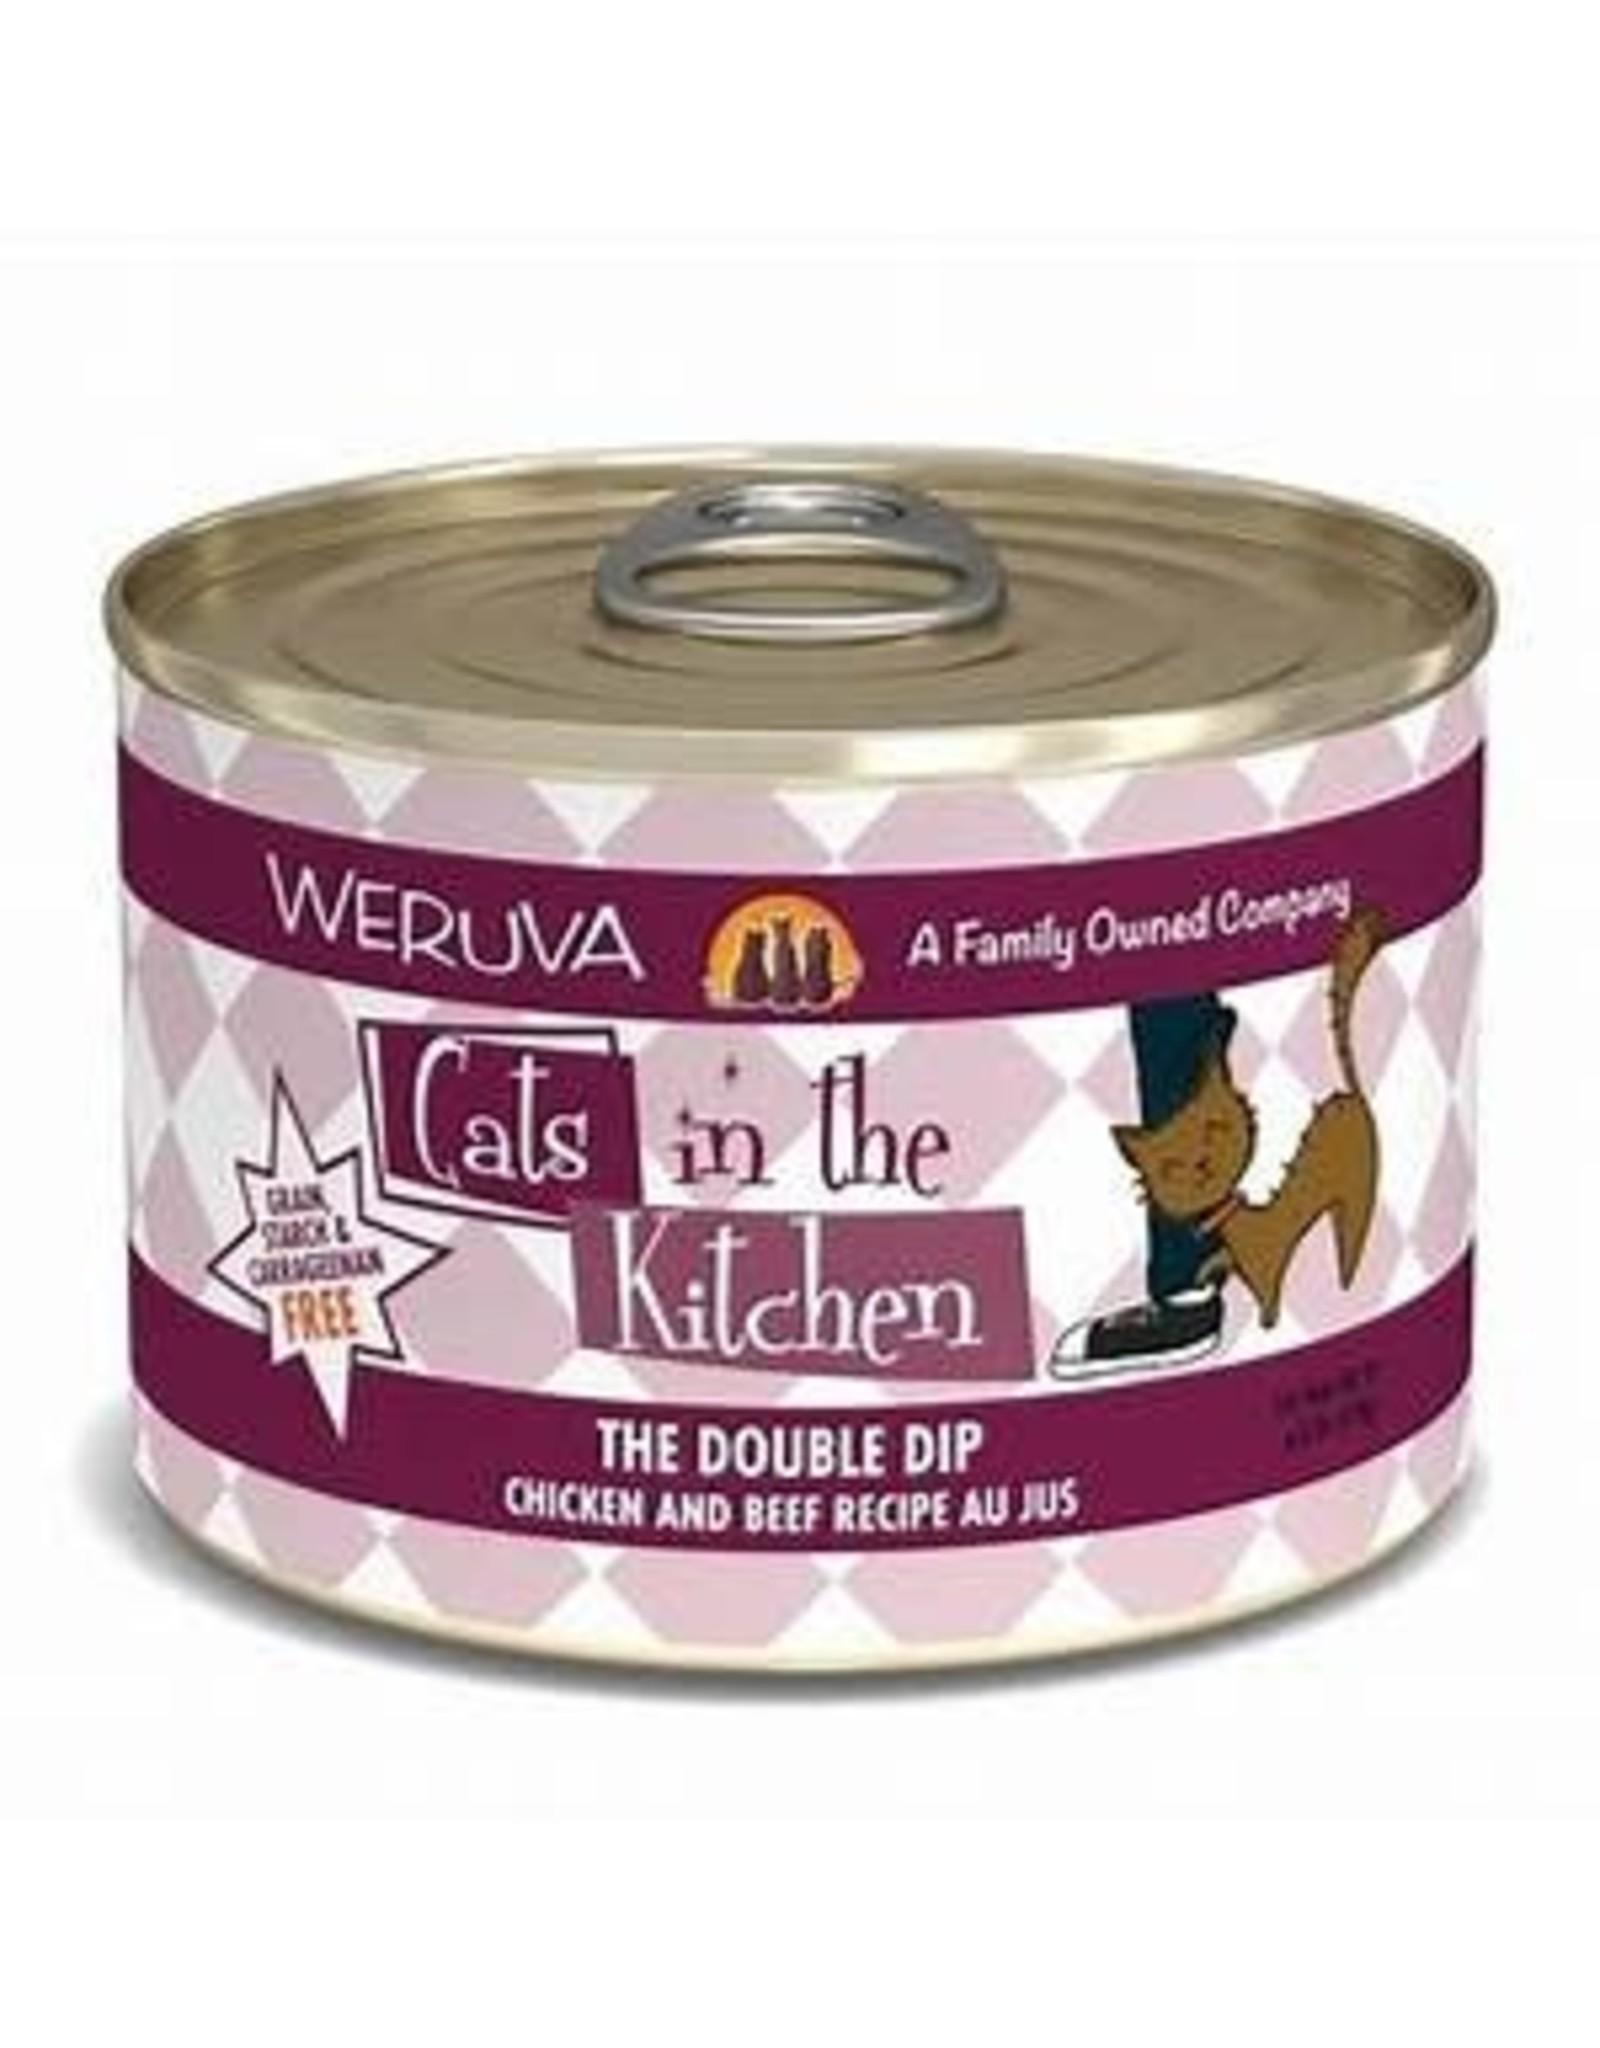 Weruva Cats in the kitcken The Double Dip 6oz